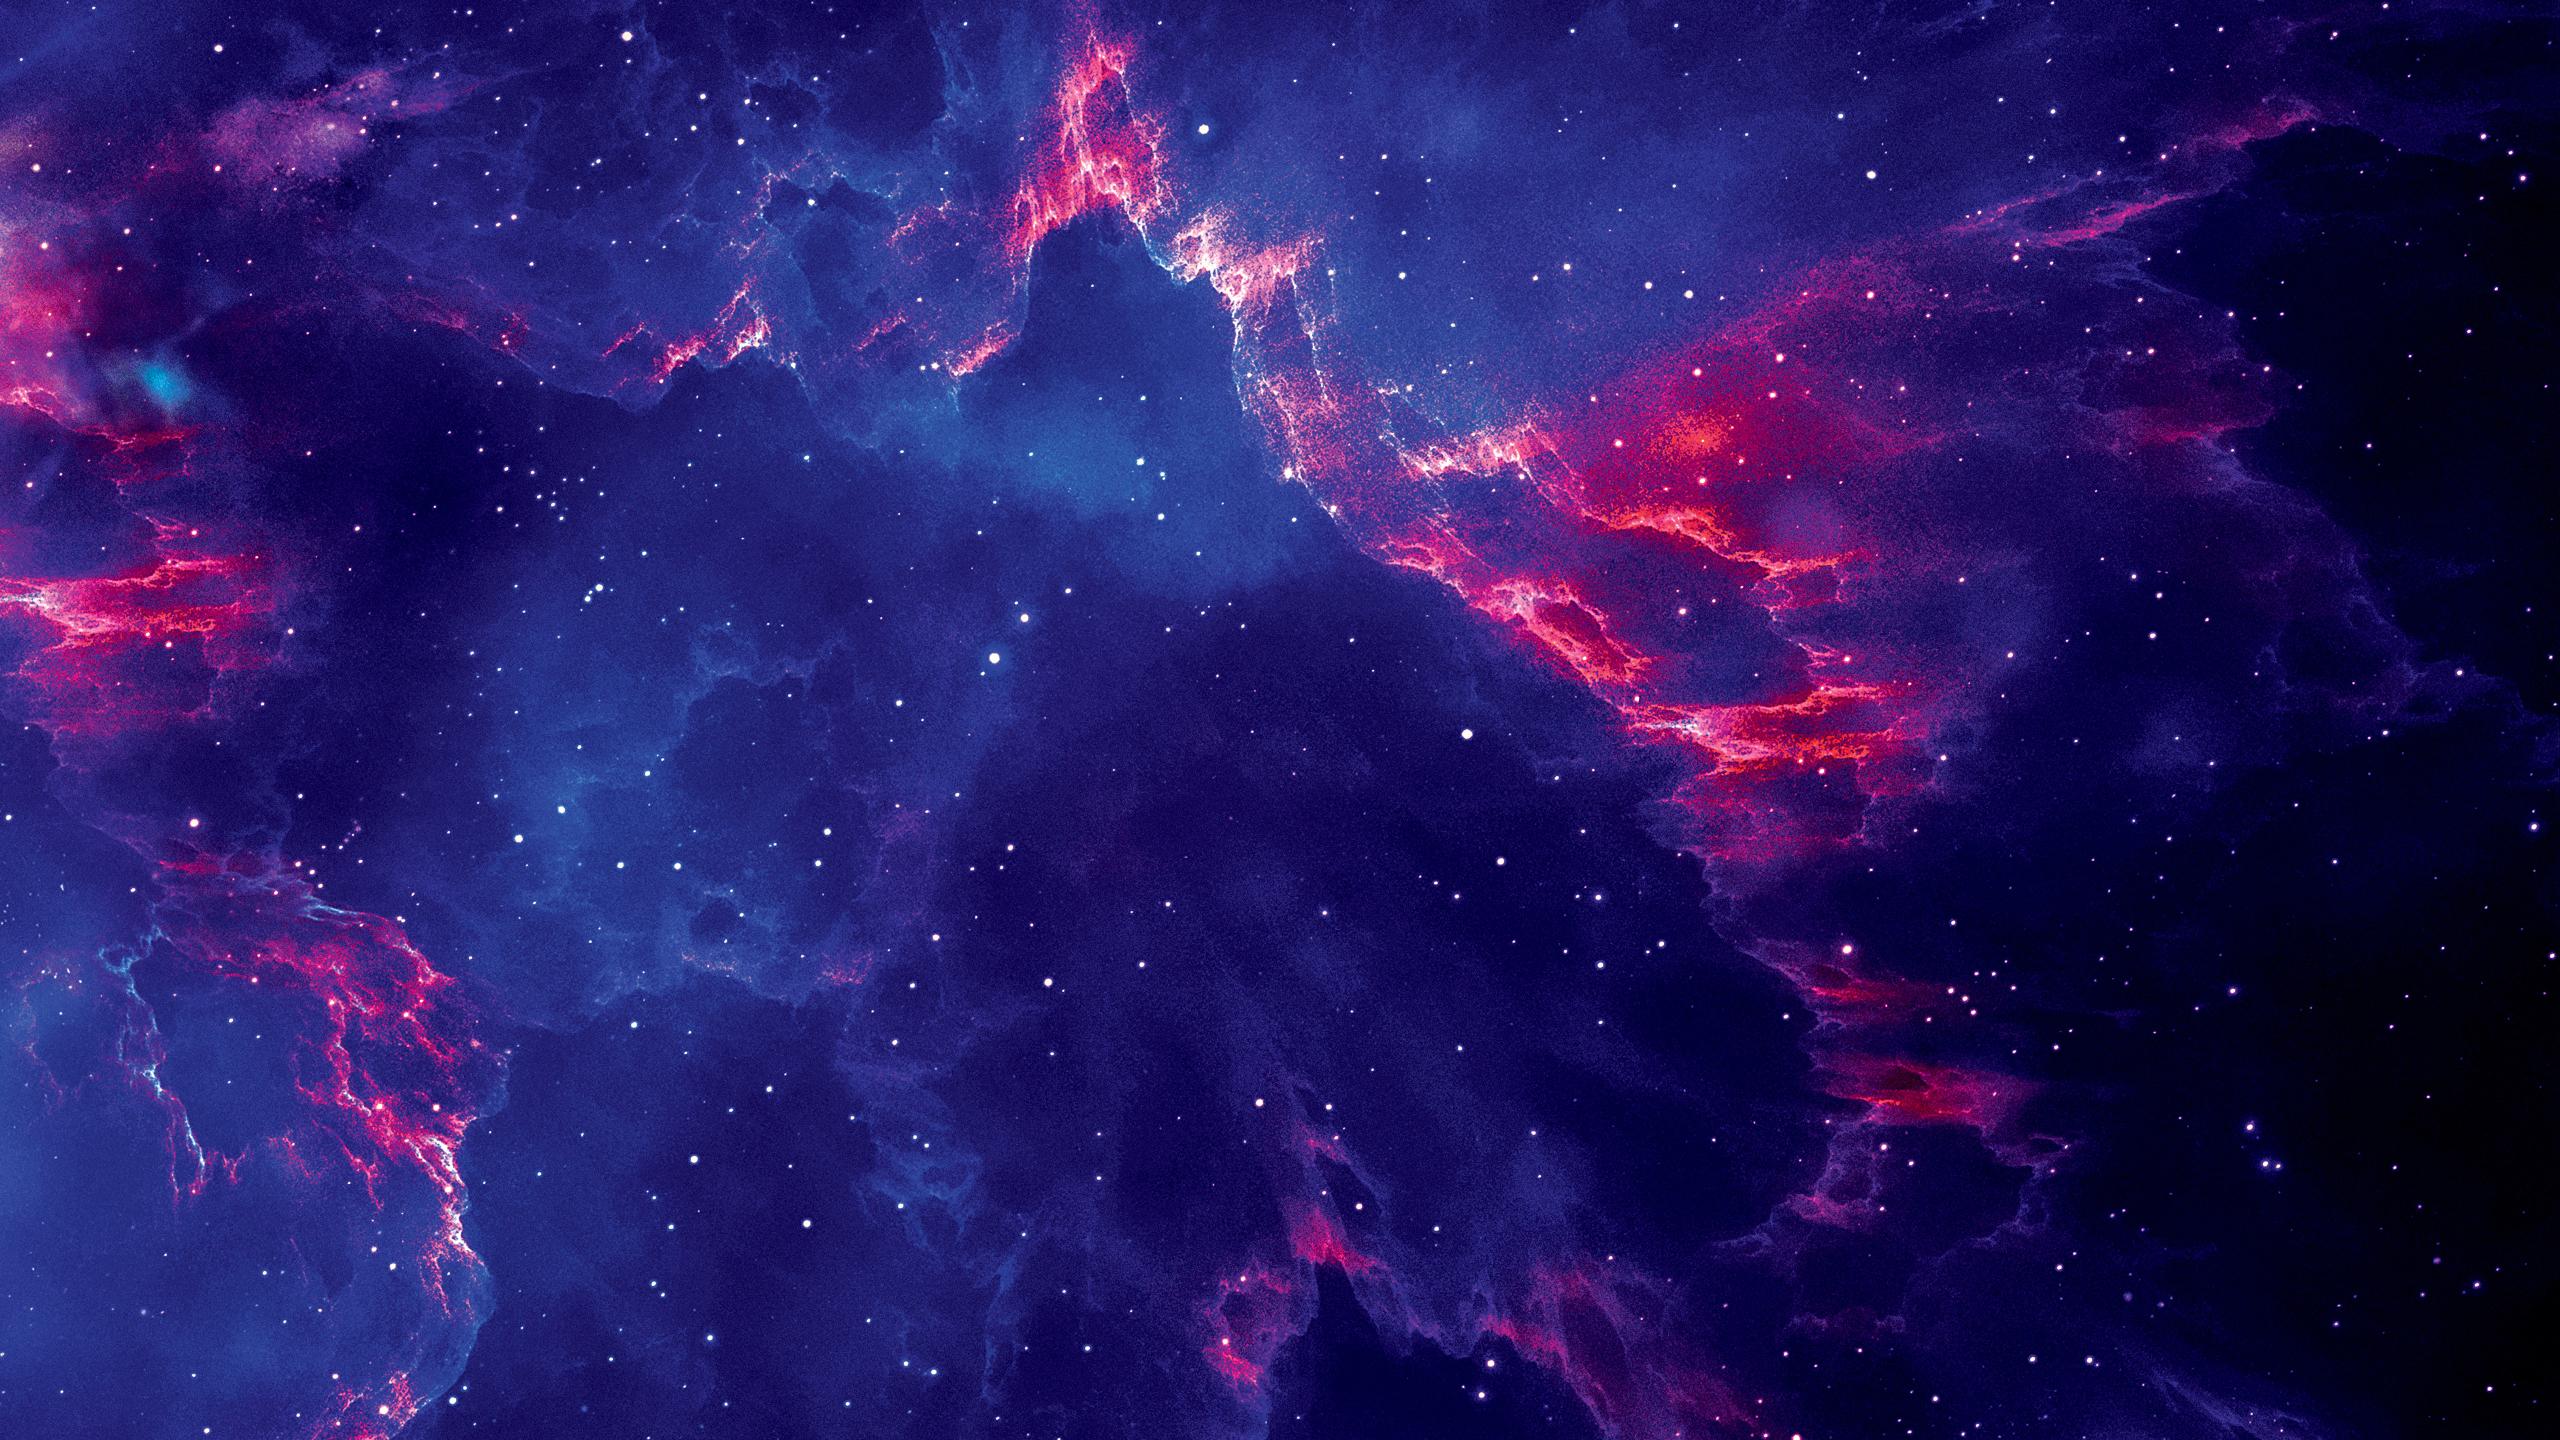 2560x1440 Starry Galaxy 1440P Resolution Background, HD ...